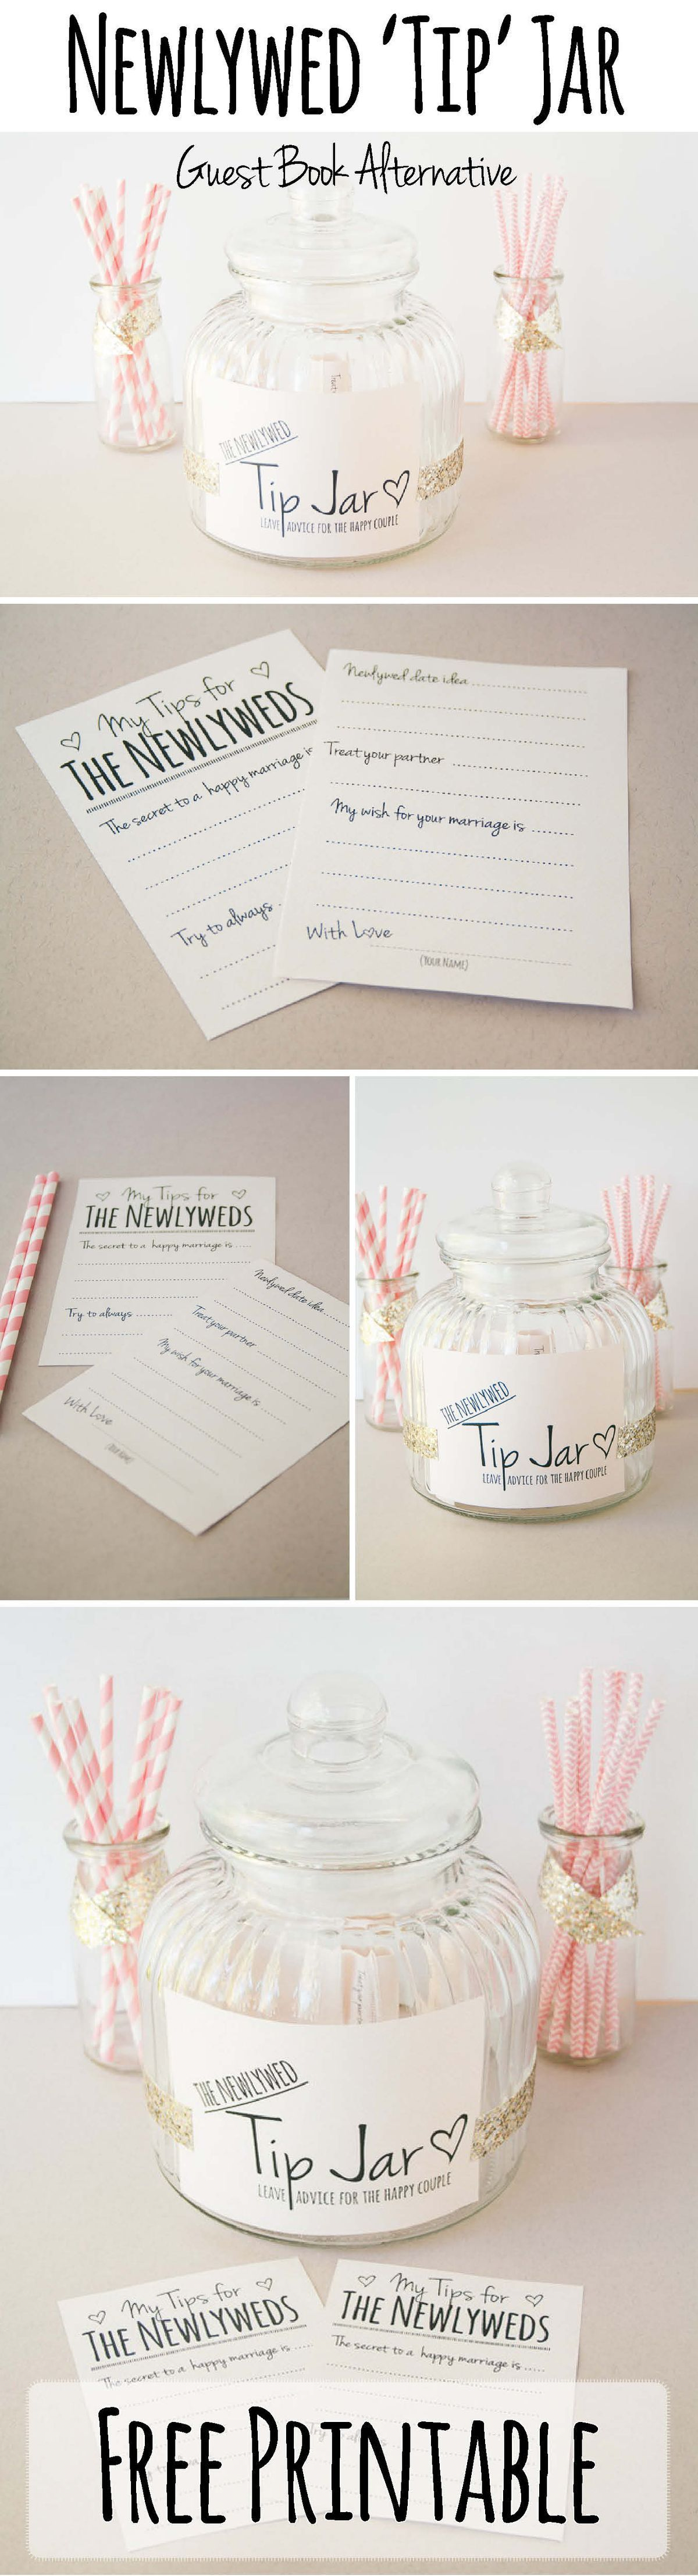 DIY Newlywed uTIPu Jar Printable Guest Book Alternative  DIY